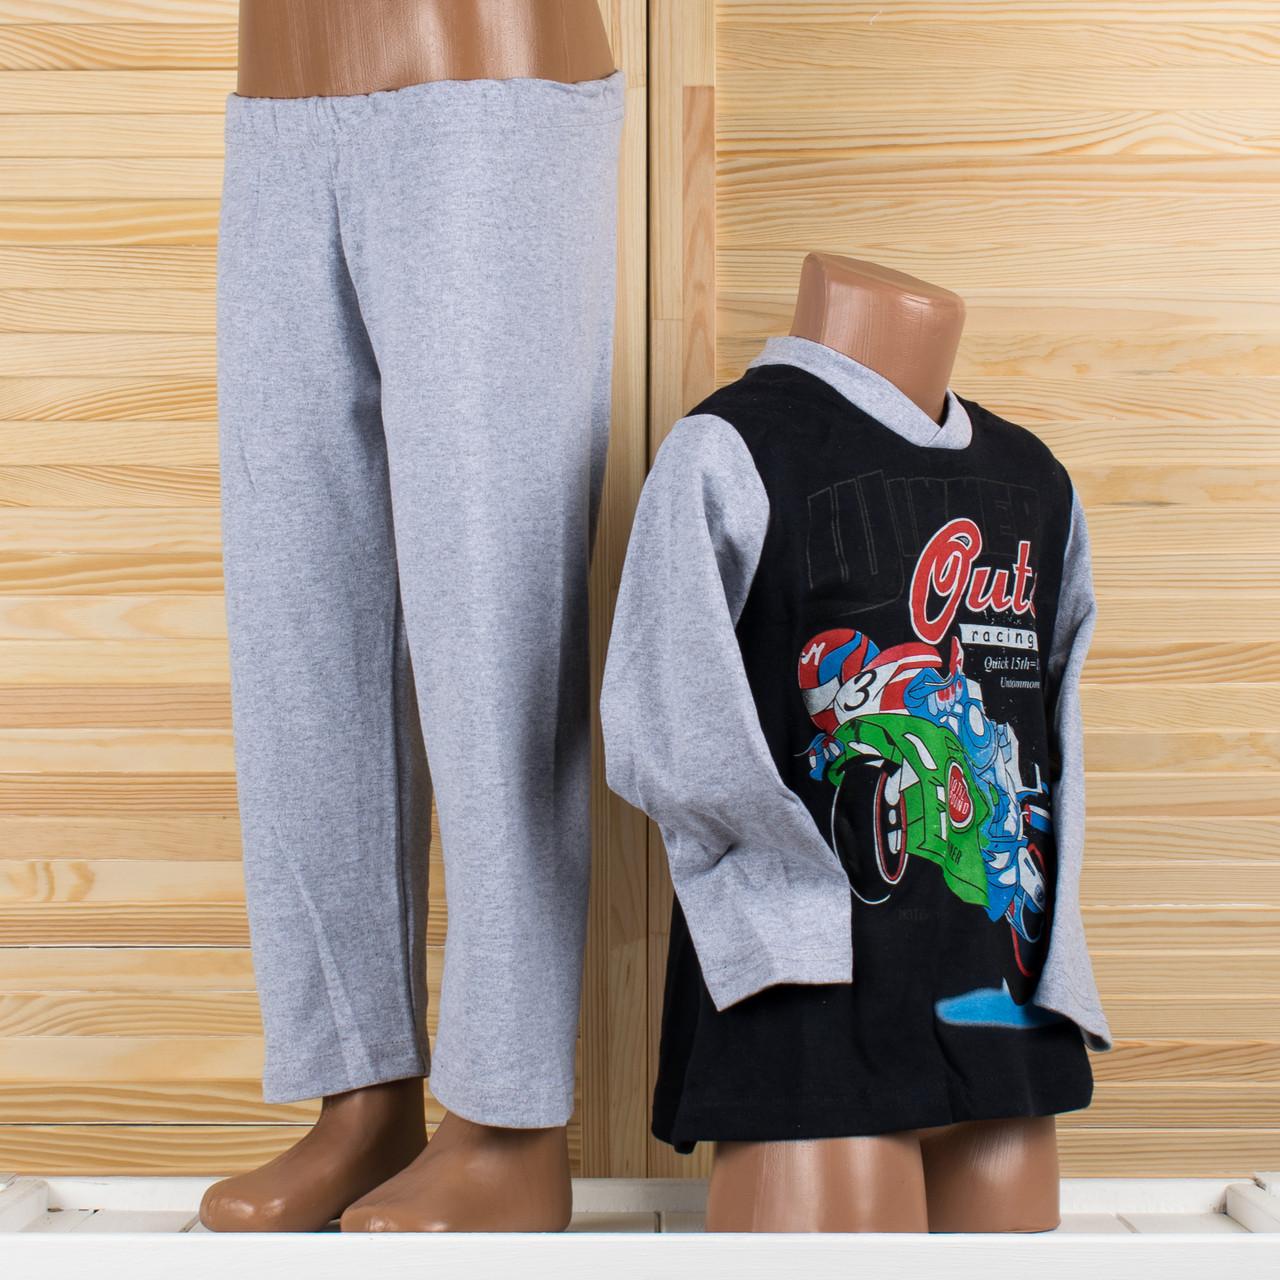 Детская пижама на мальчика Турция. Moral 07-6 2/3. Размер на 2/3 года.